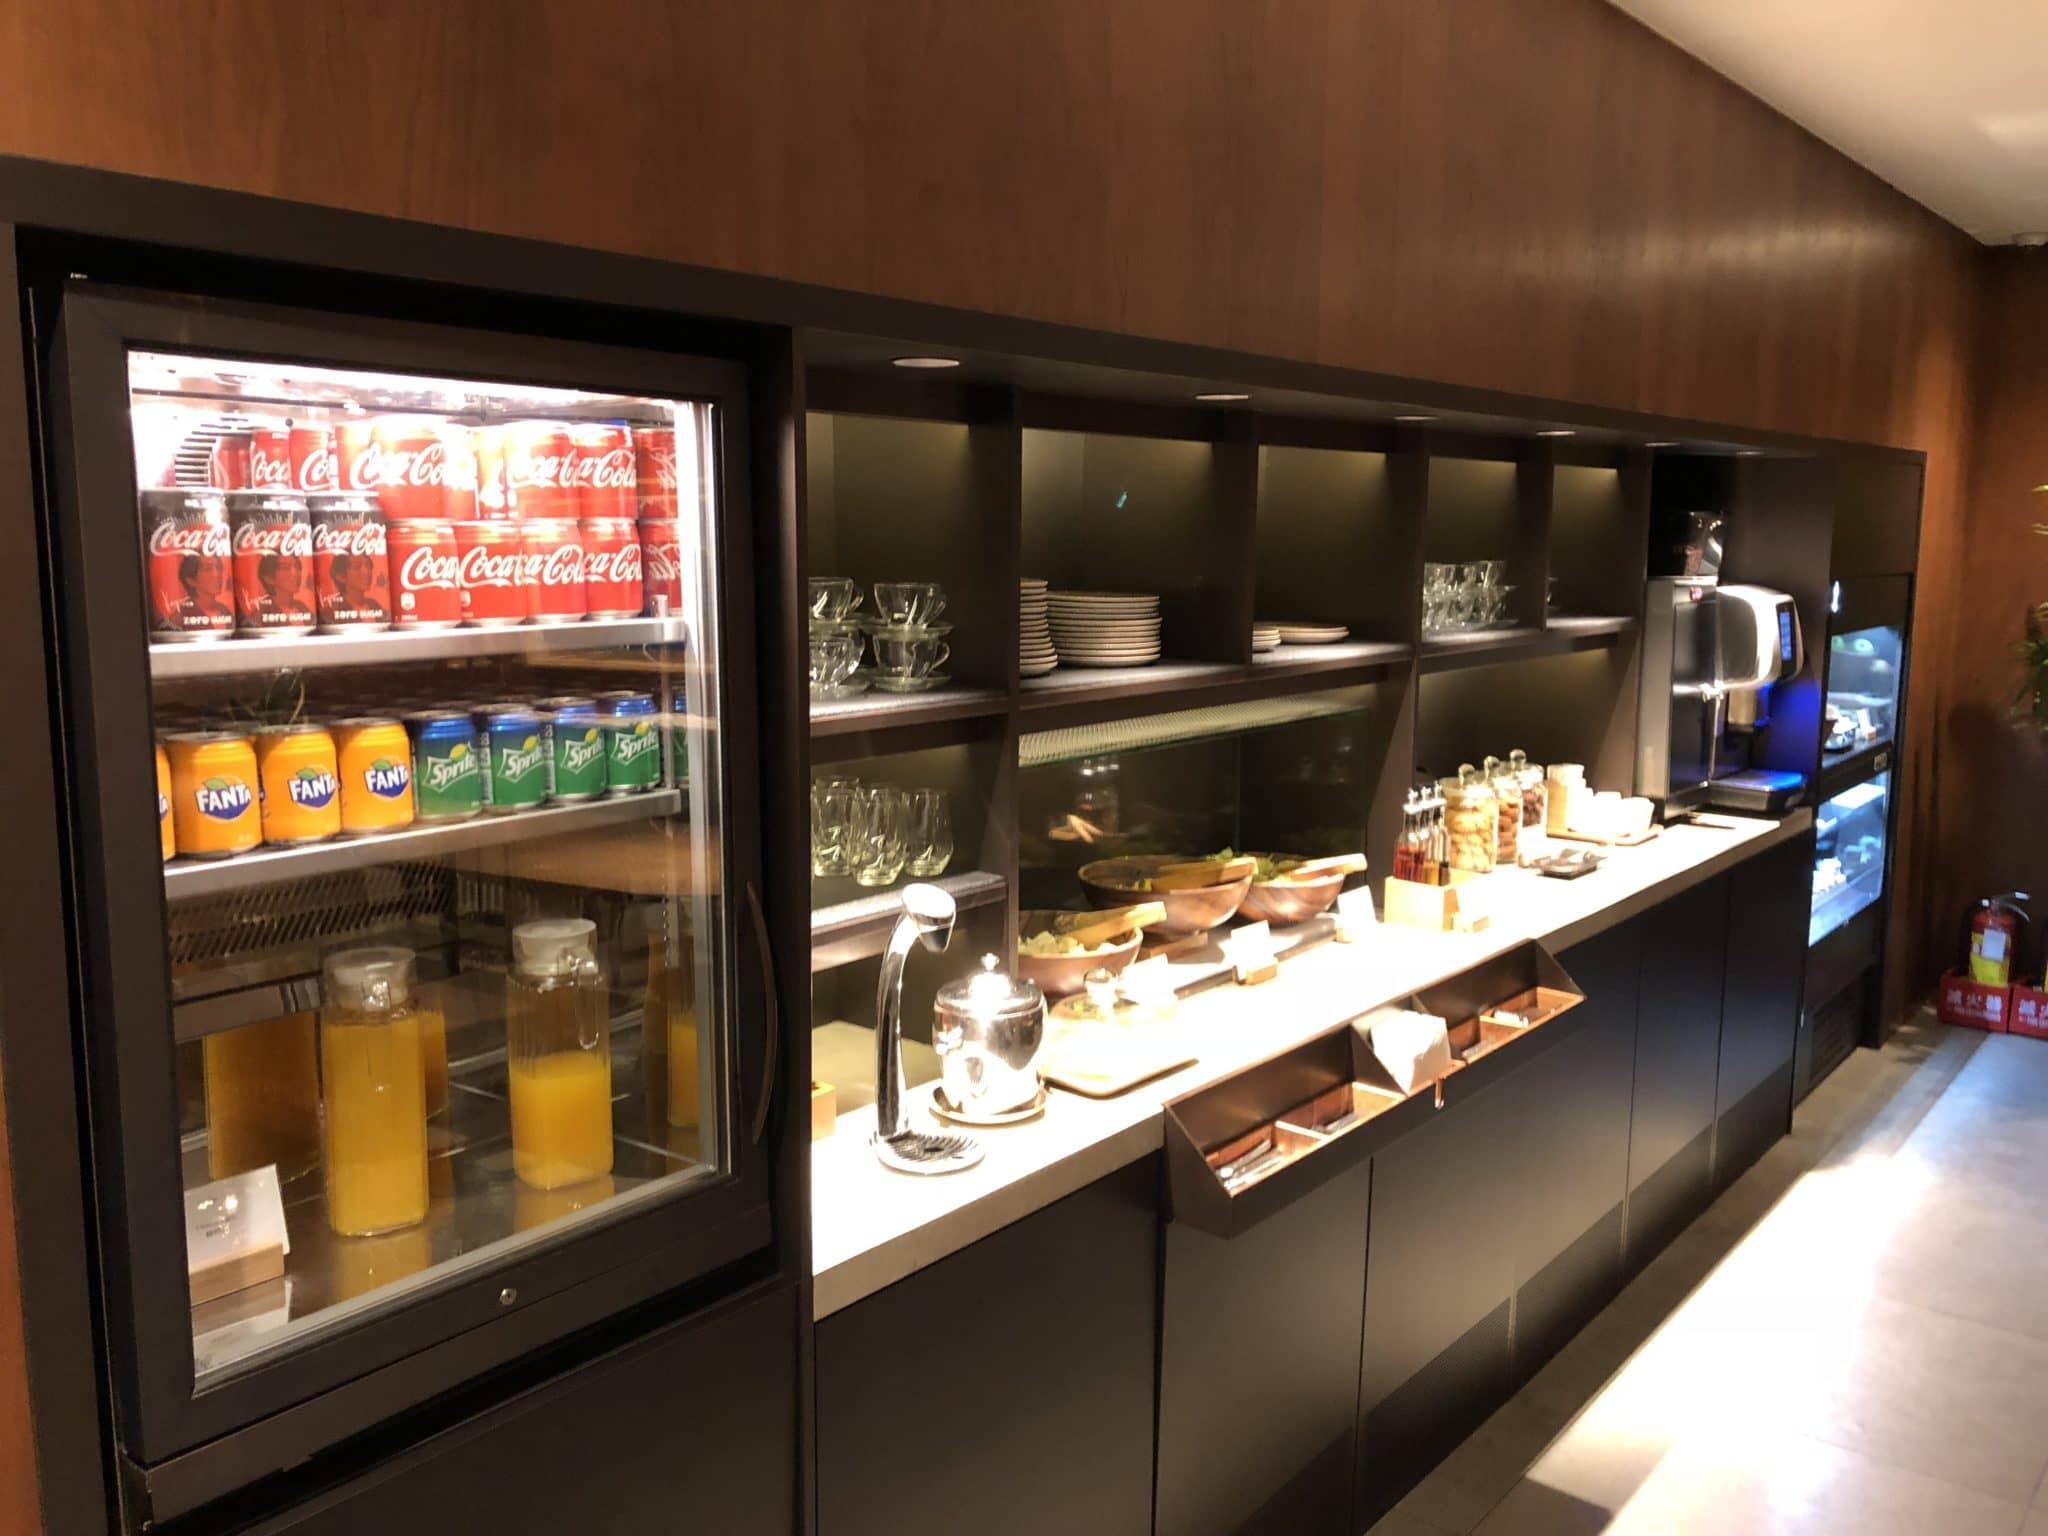 Cathay Pacific Business Class Lounge Taiwan-Taoyuan Snackbar